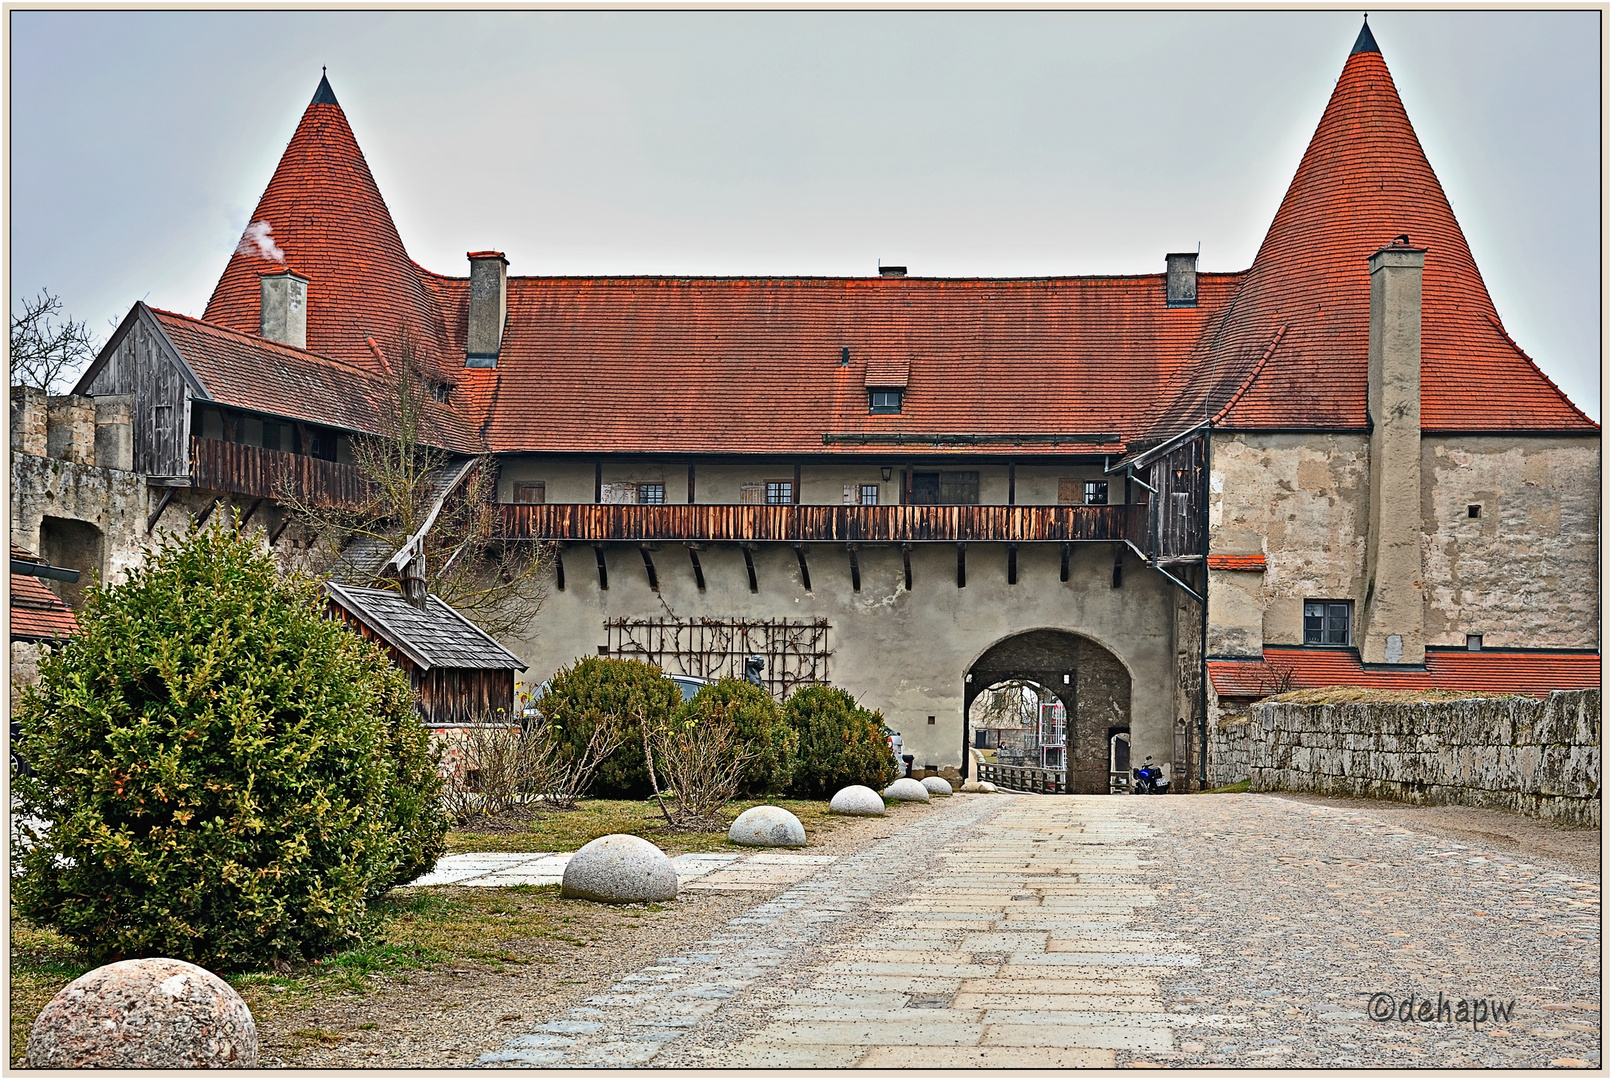 Teil der Burganlage Burghausen/Bayern